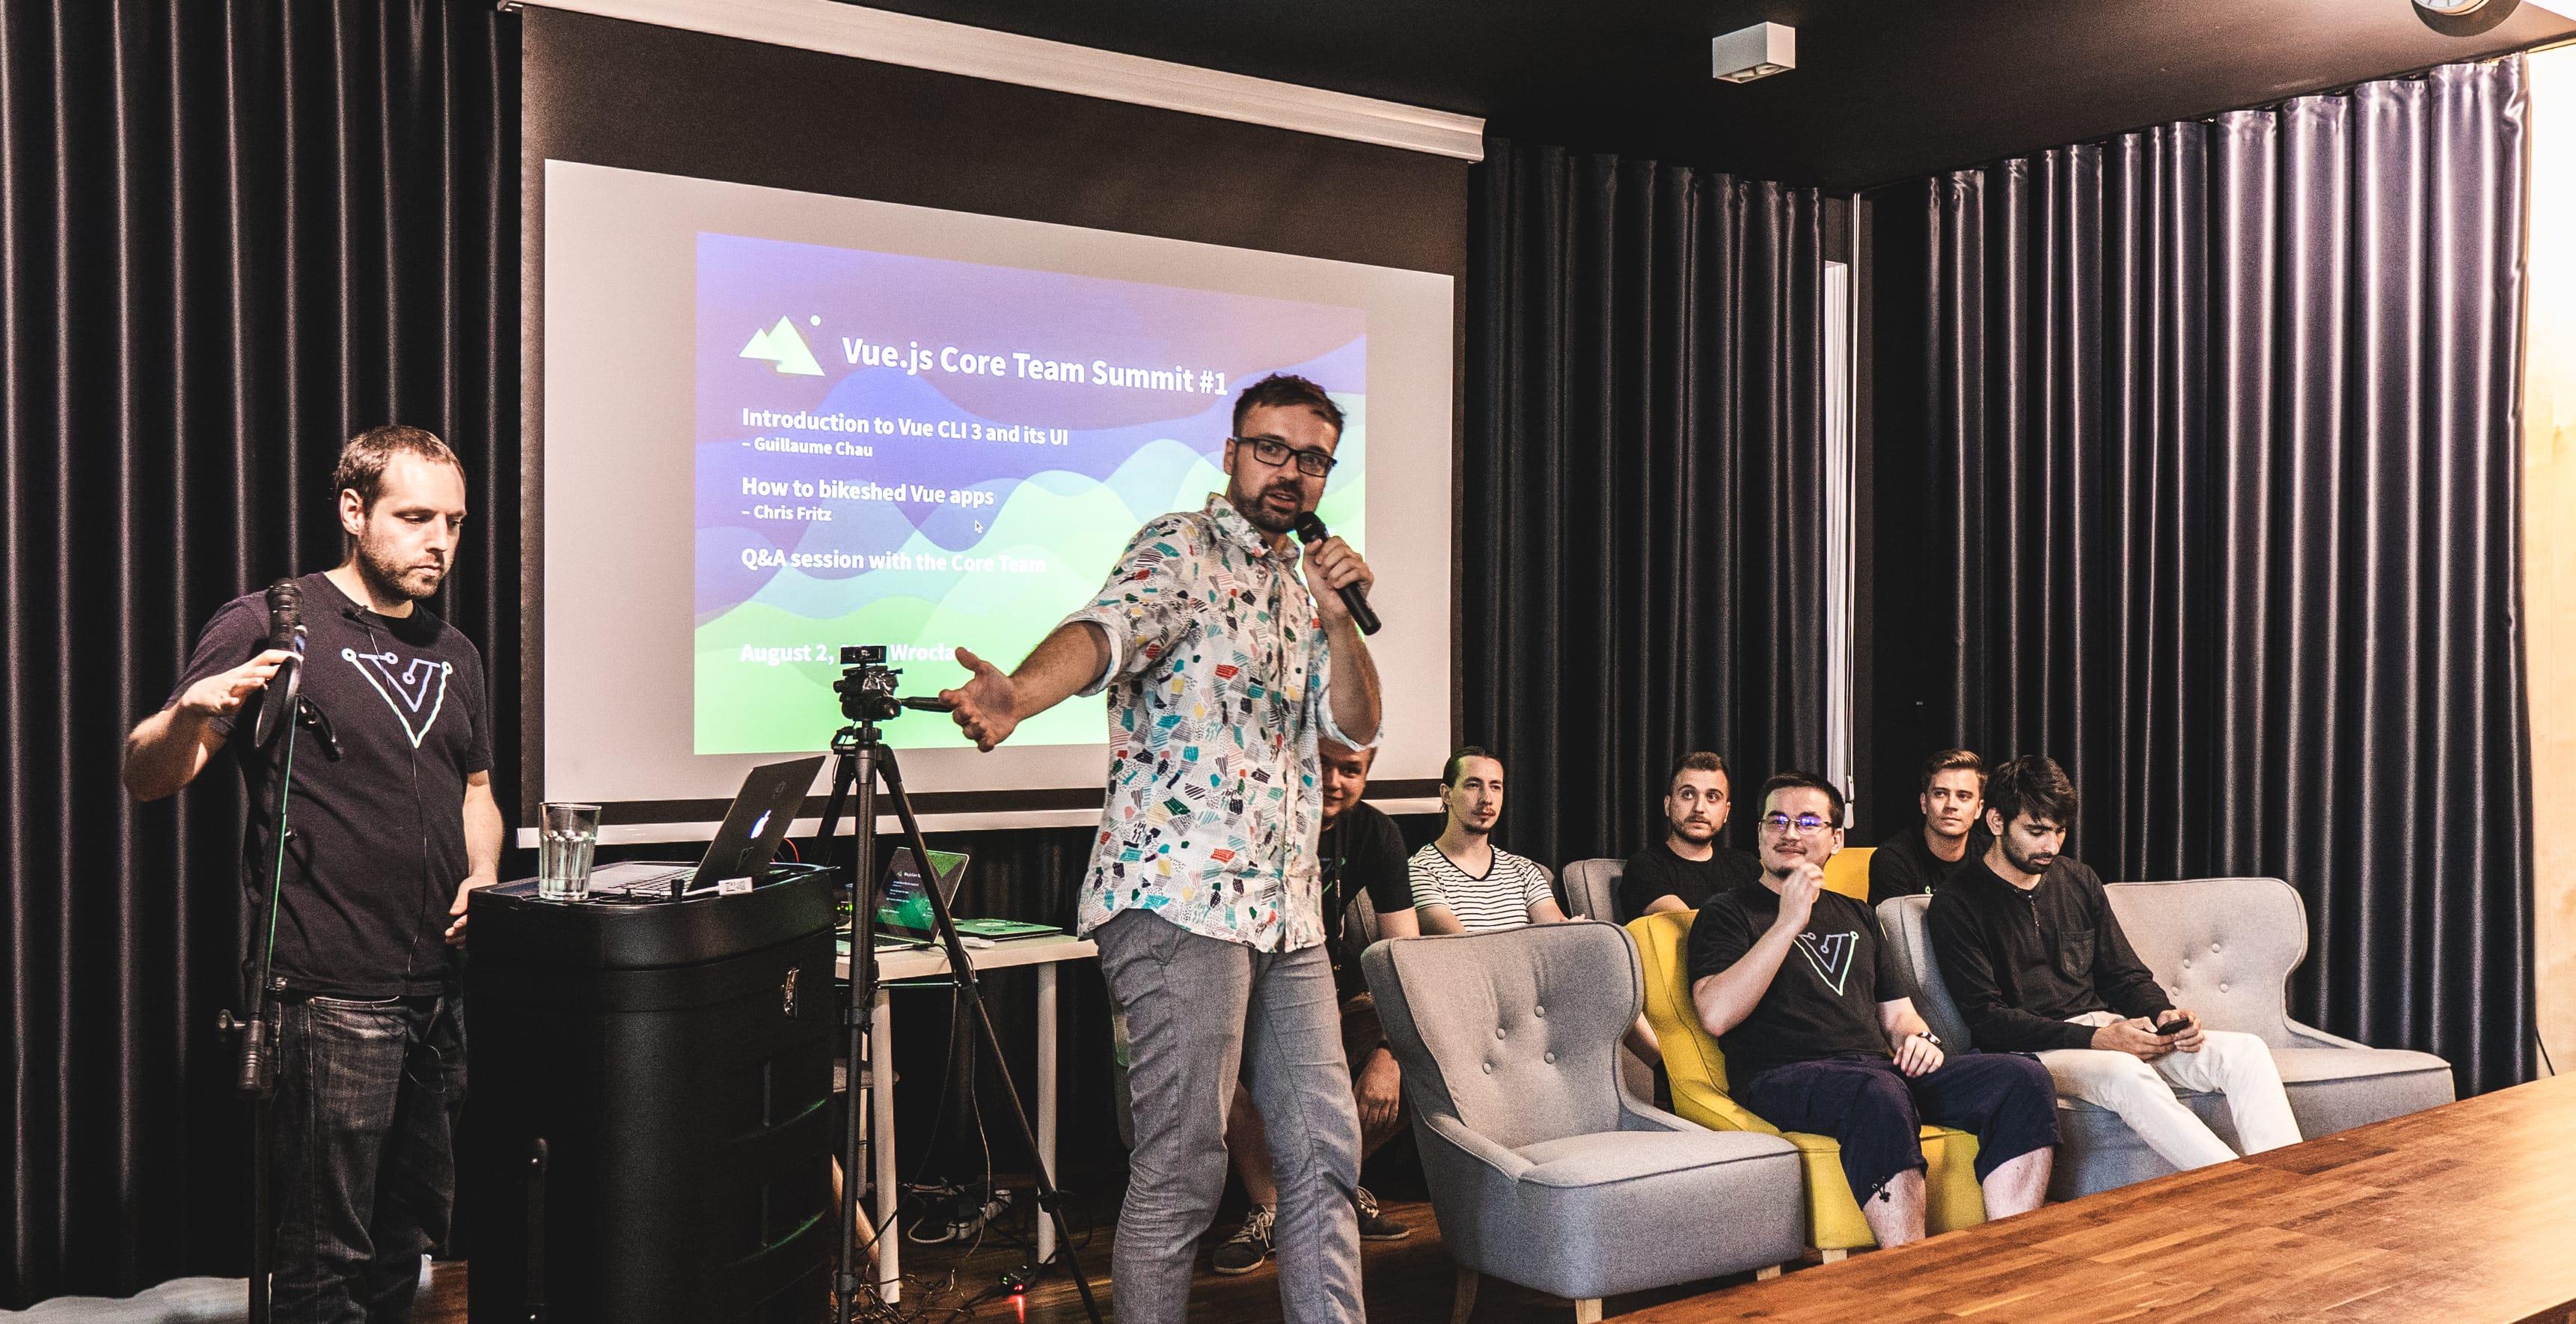 Vue.js Core Team visit in Wrocław, Monterail